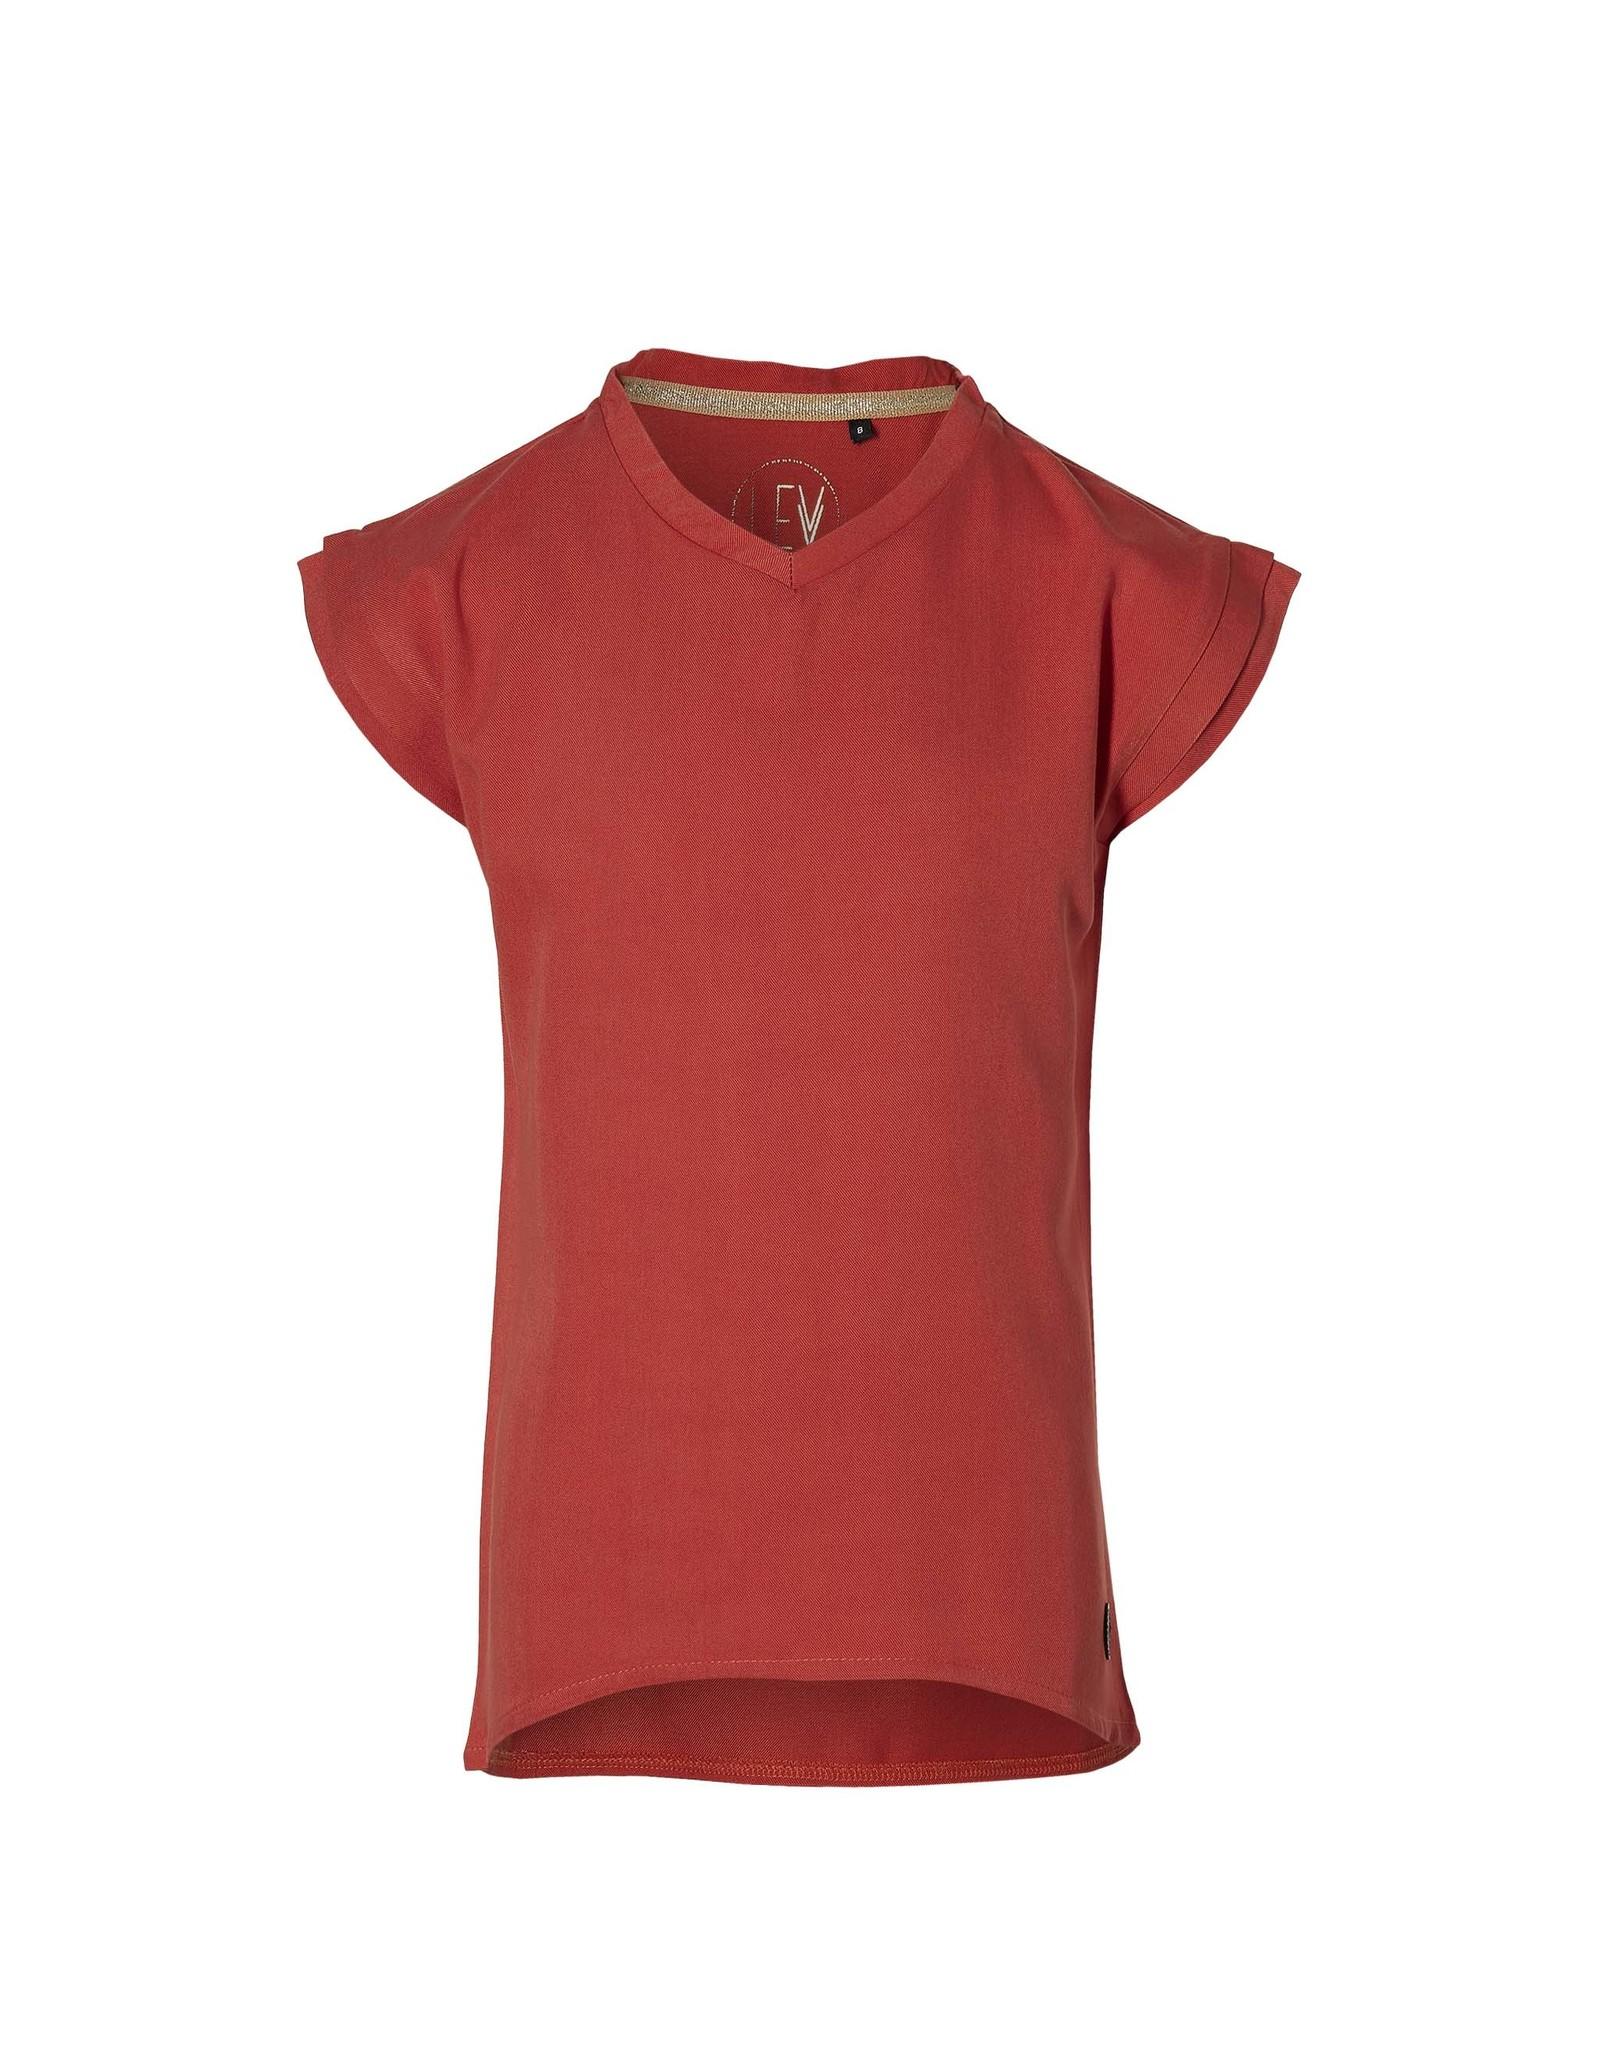 LEVV Levv meiden viscose t-shirt Maureen Stone Red